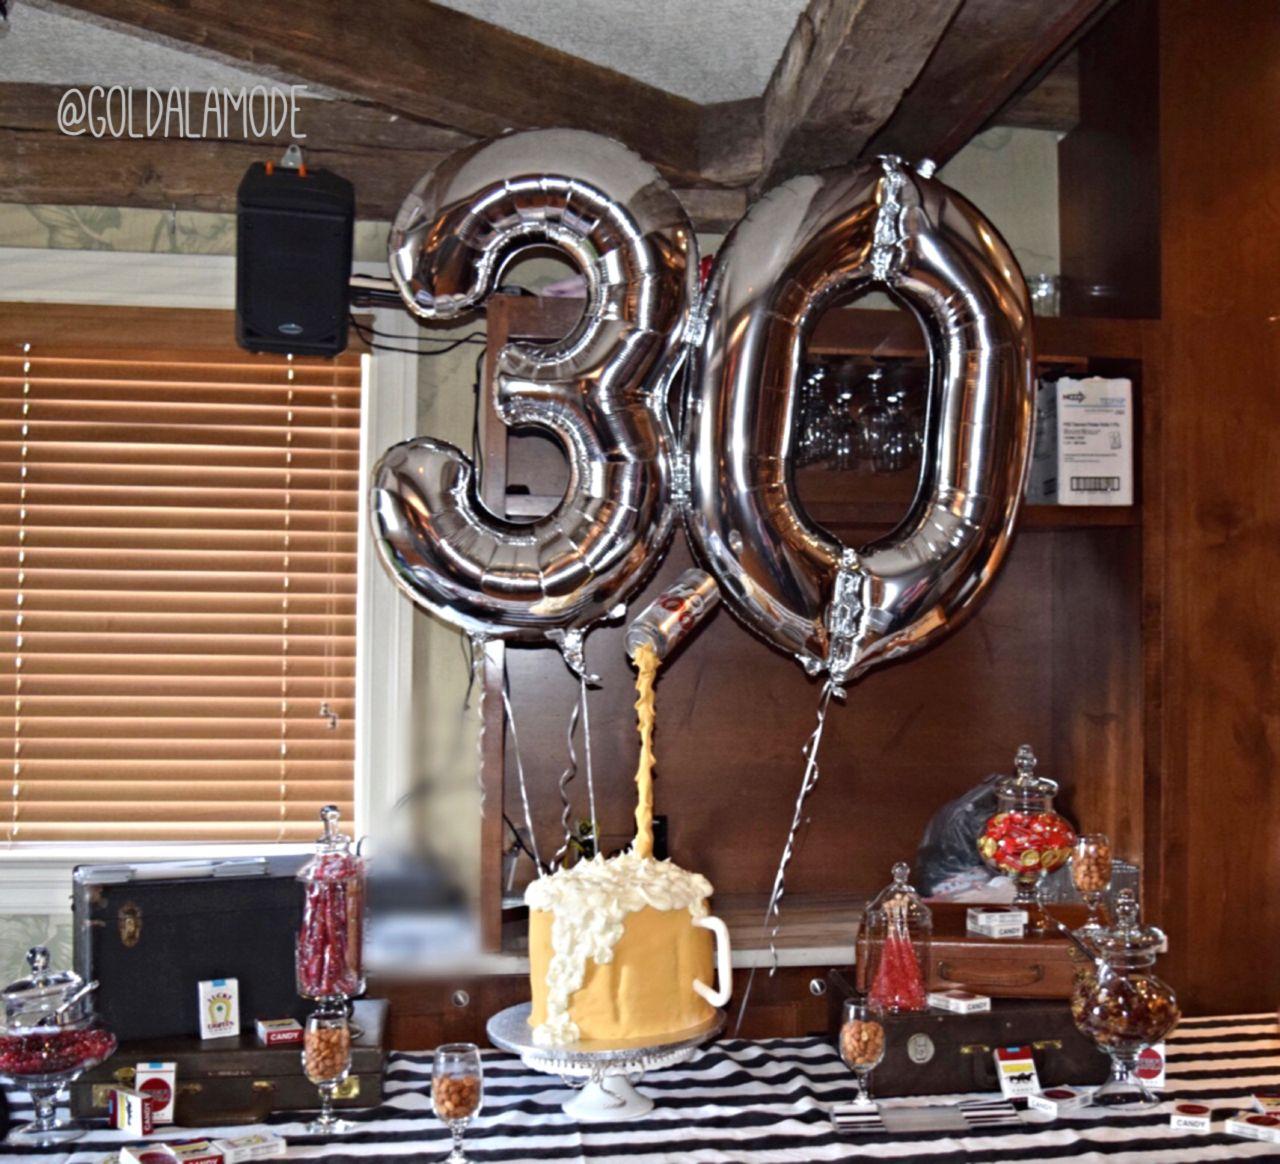 30th Surprise Party For Him Beer Mug Cake Vintage